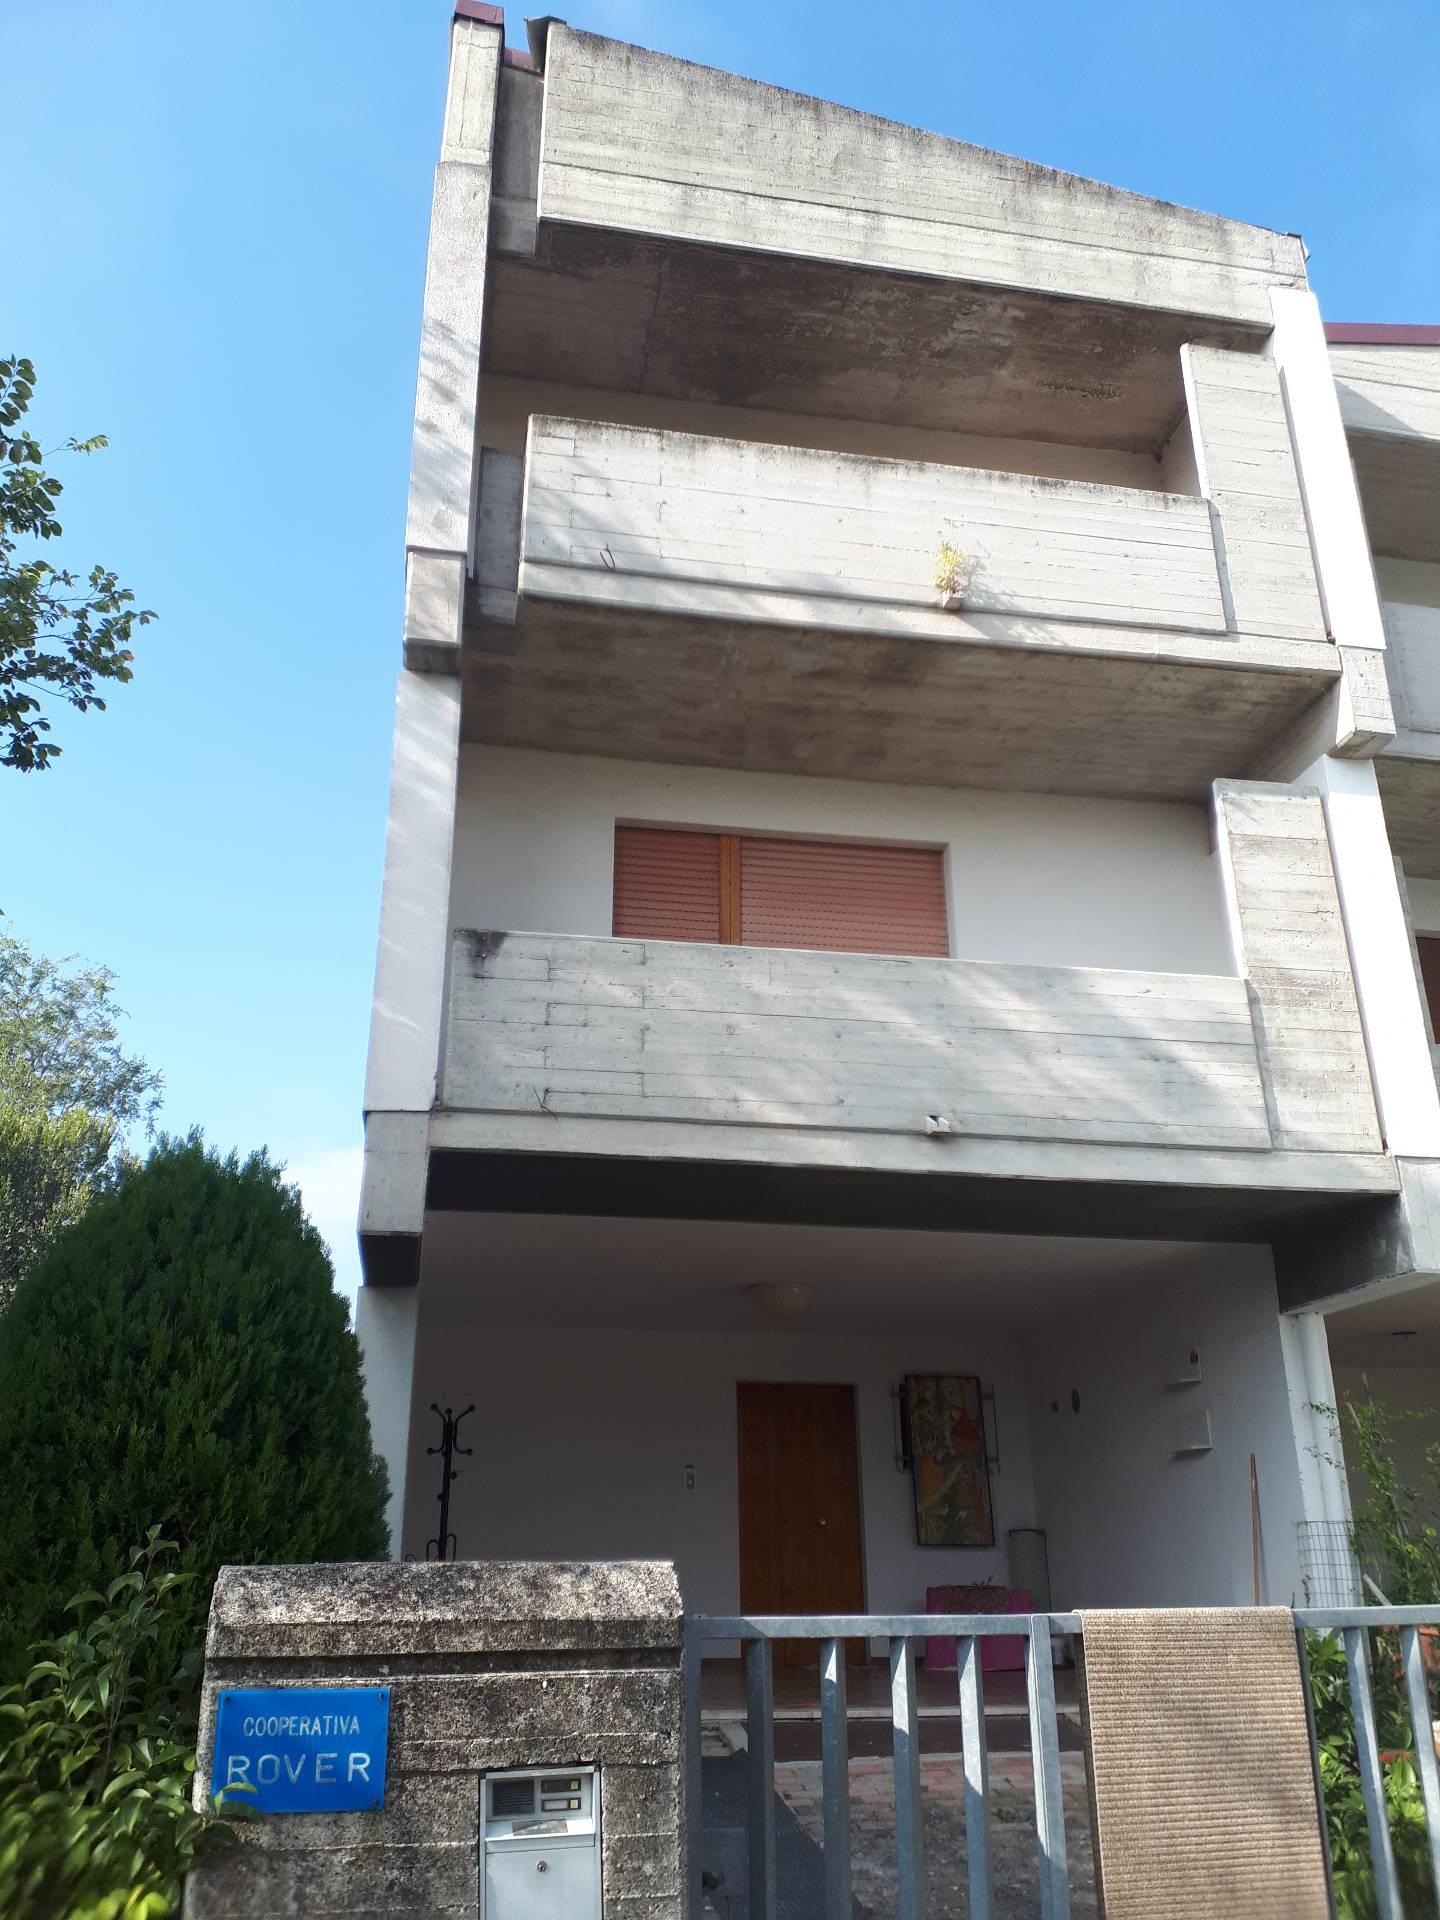 Villa - Casa, 180 Mq, Vendita - Teramo (TE)